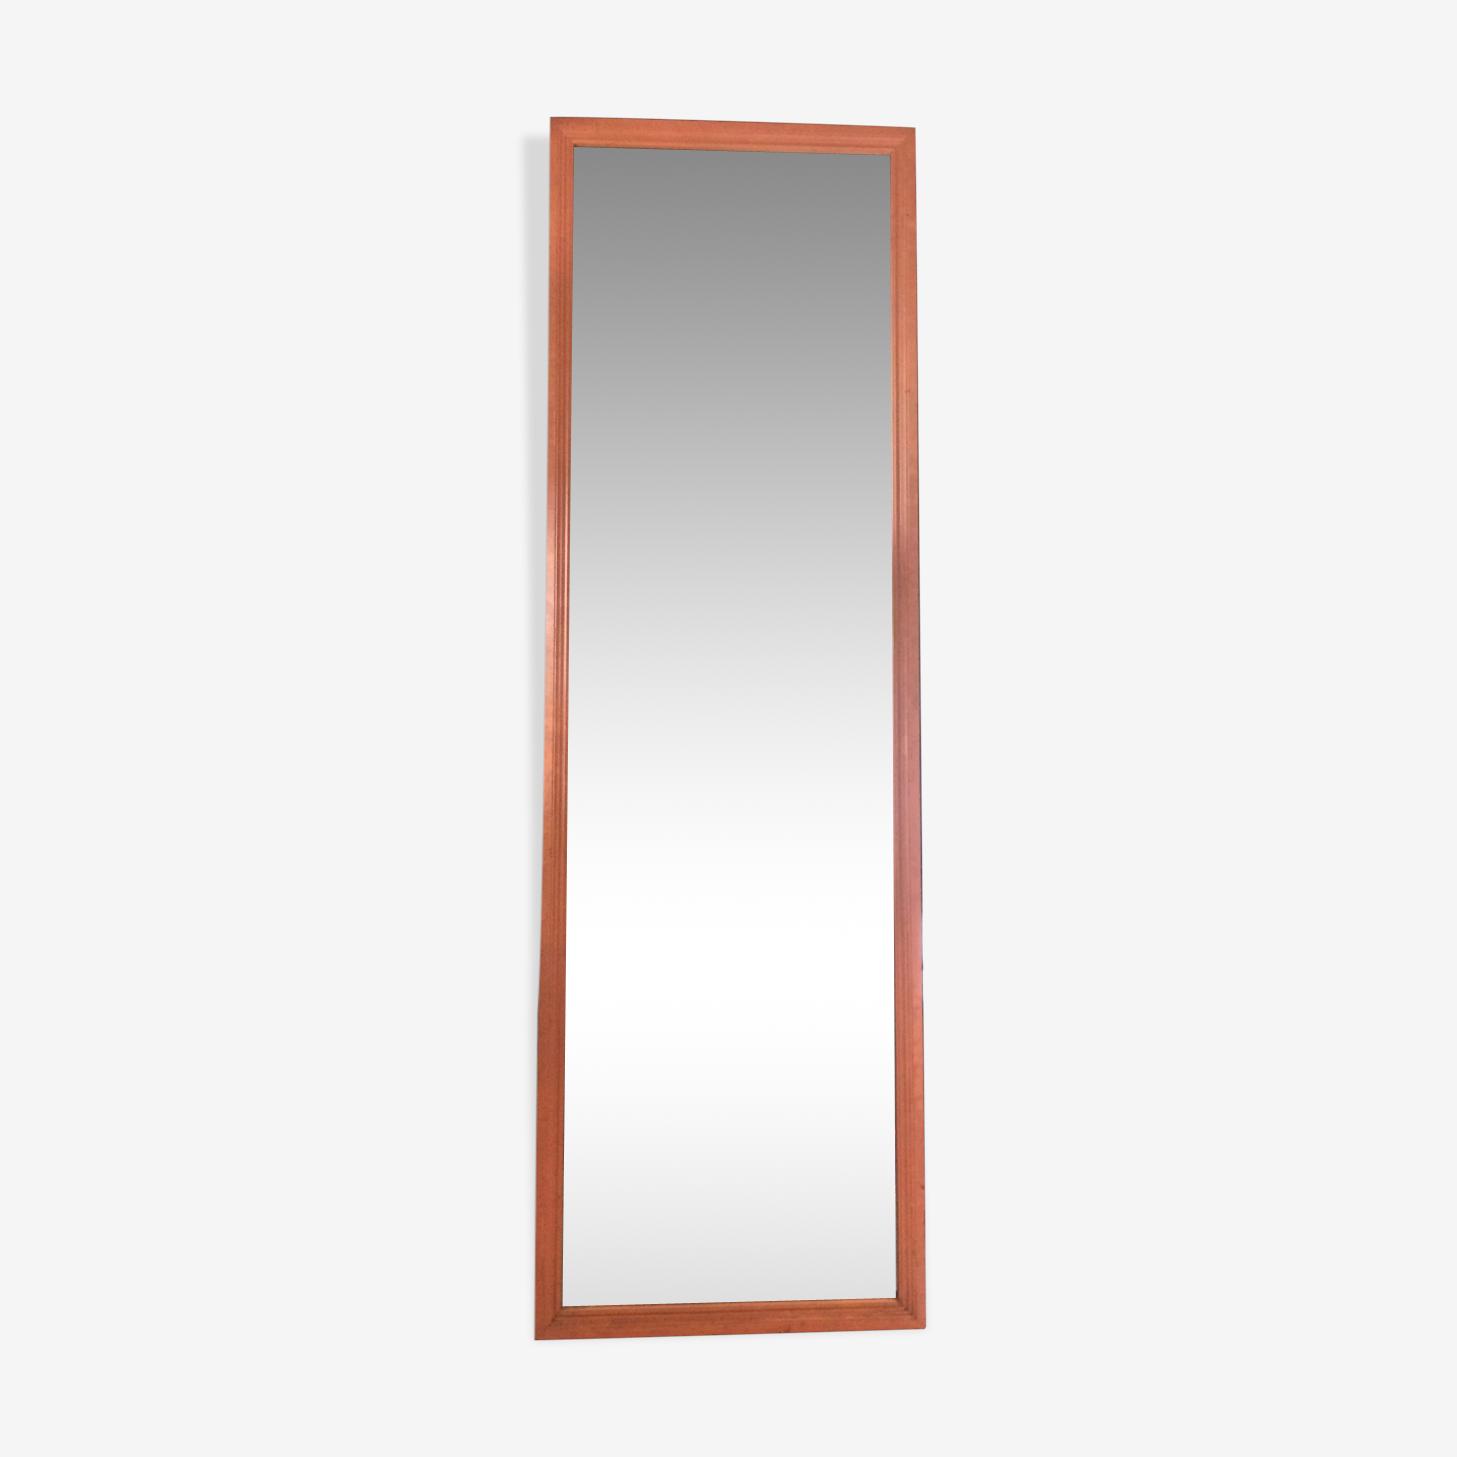 Mirror size 312x98cm